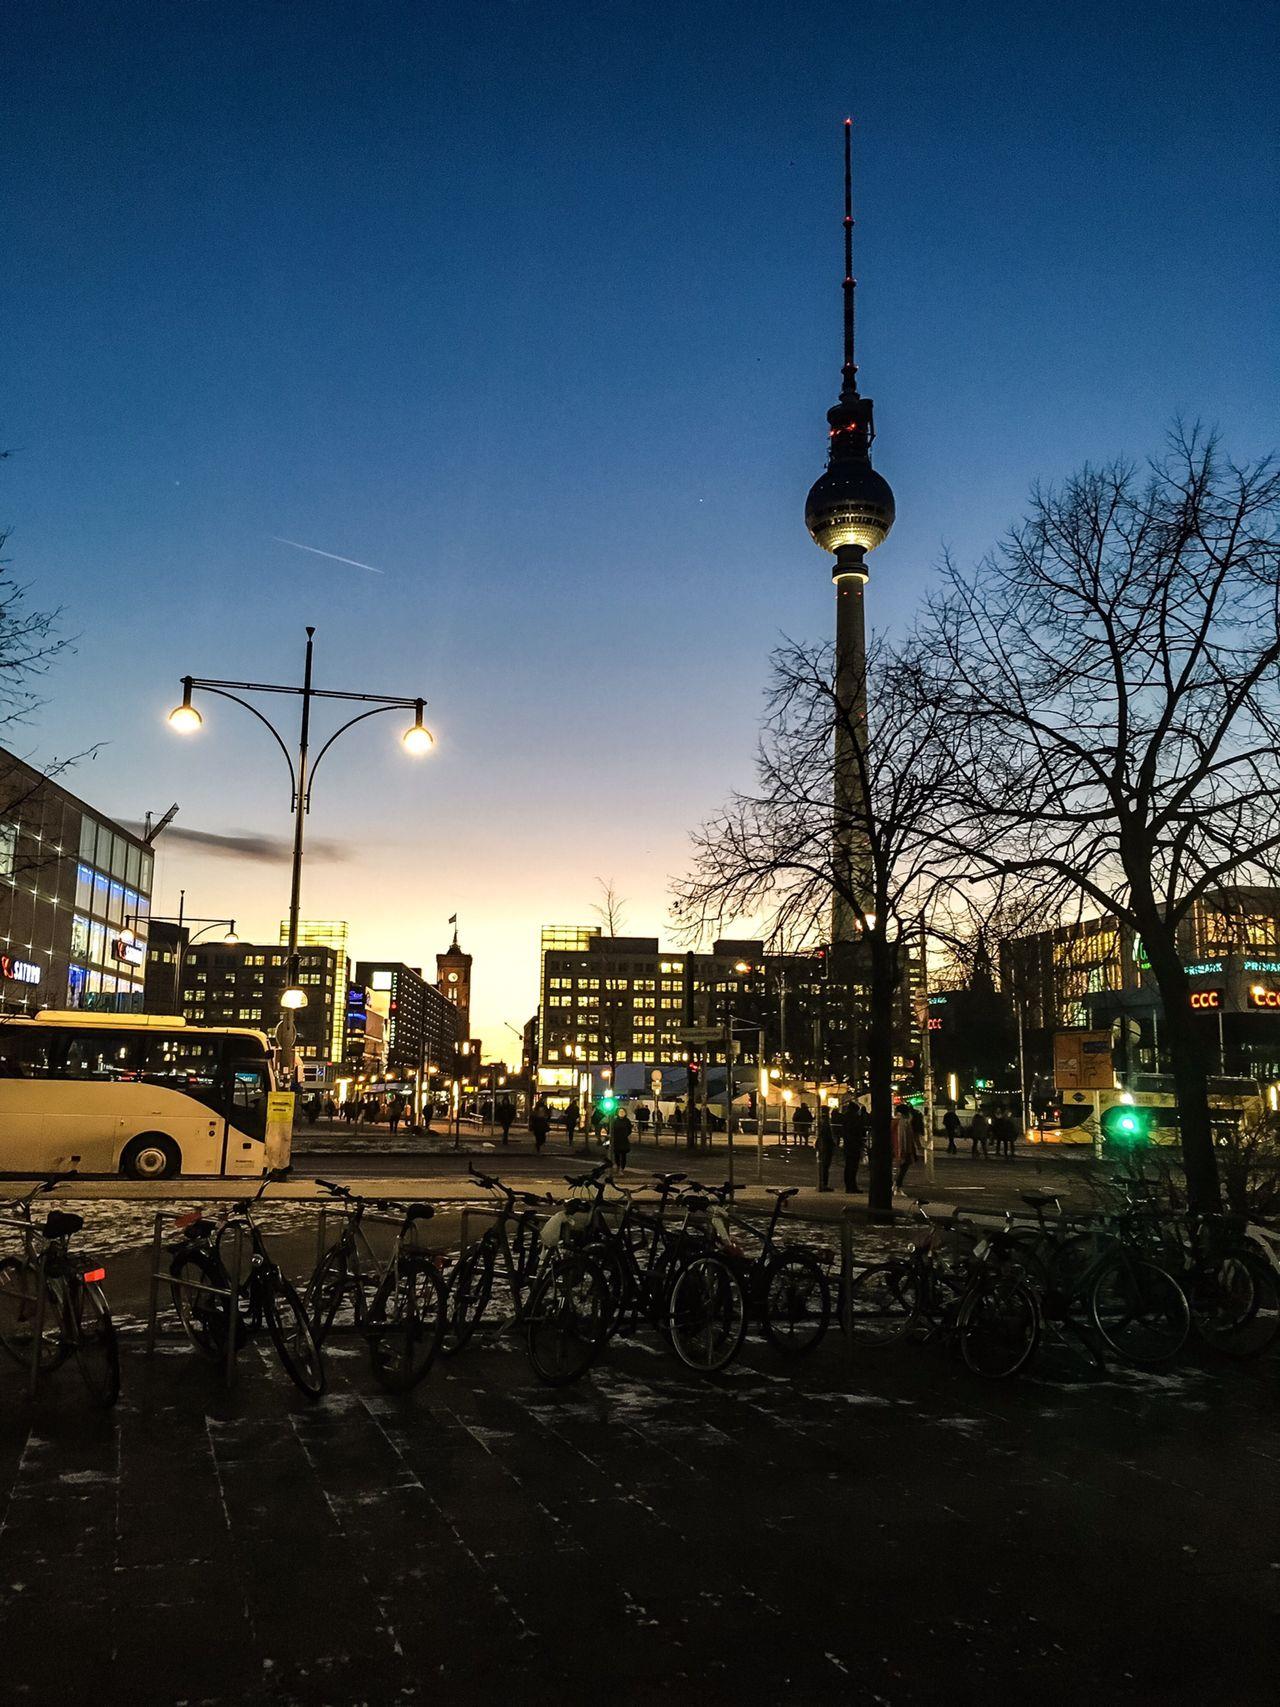 Alexanderplatz Berlin Night Night Lights Sunset City Cityscape Tower Vertical Blue Sky Sky Europe First Eyeem Photo